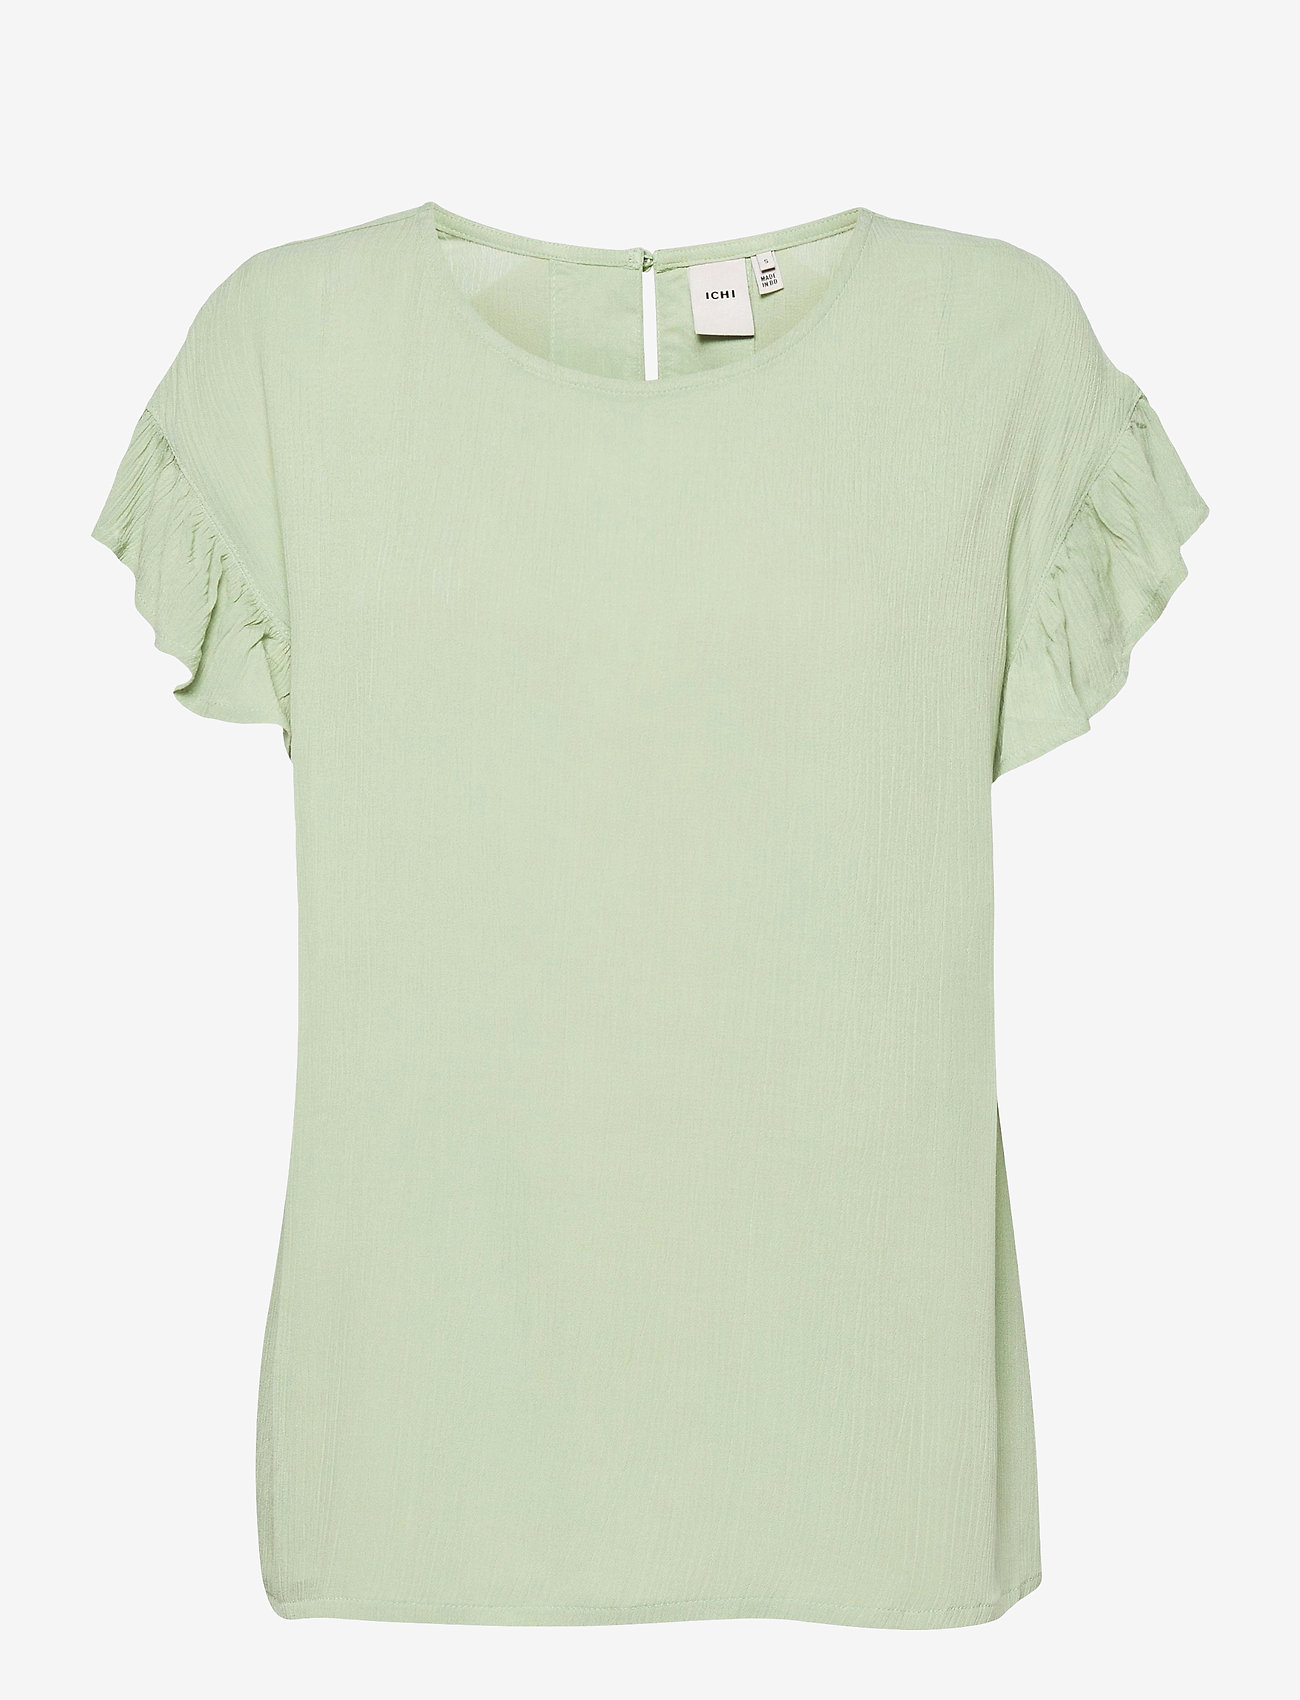 ICHI - IHMARRAKECH SO SS4 - short-sleeved blouses - swamp - 0